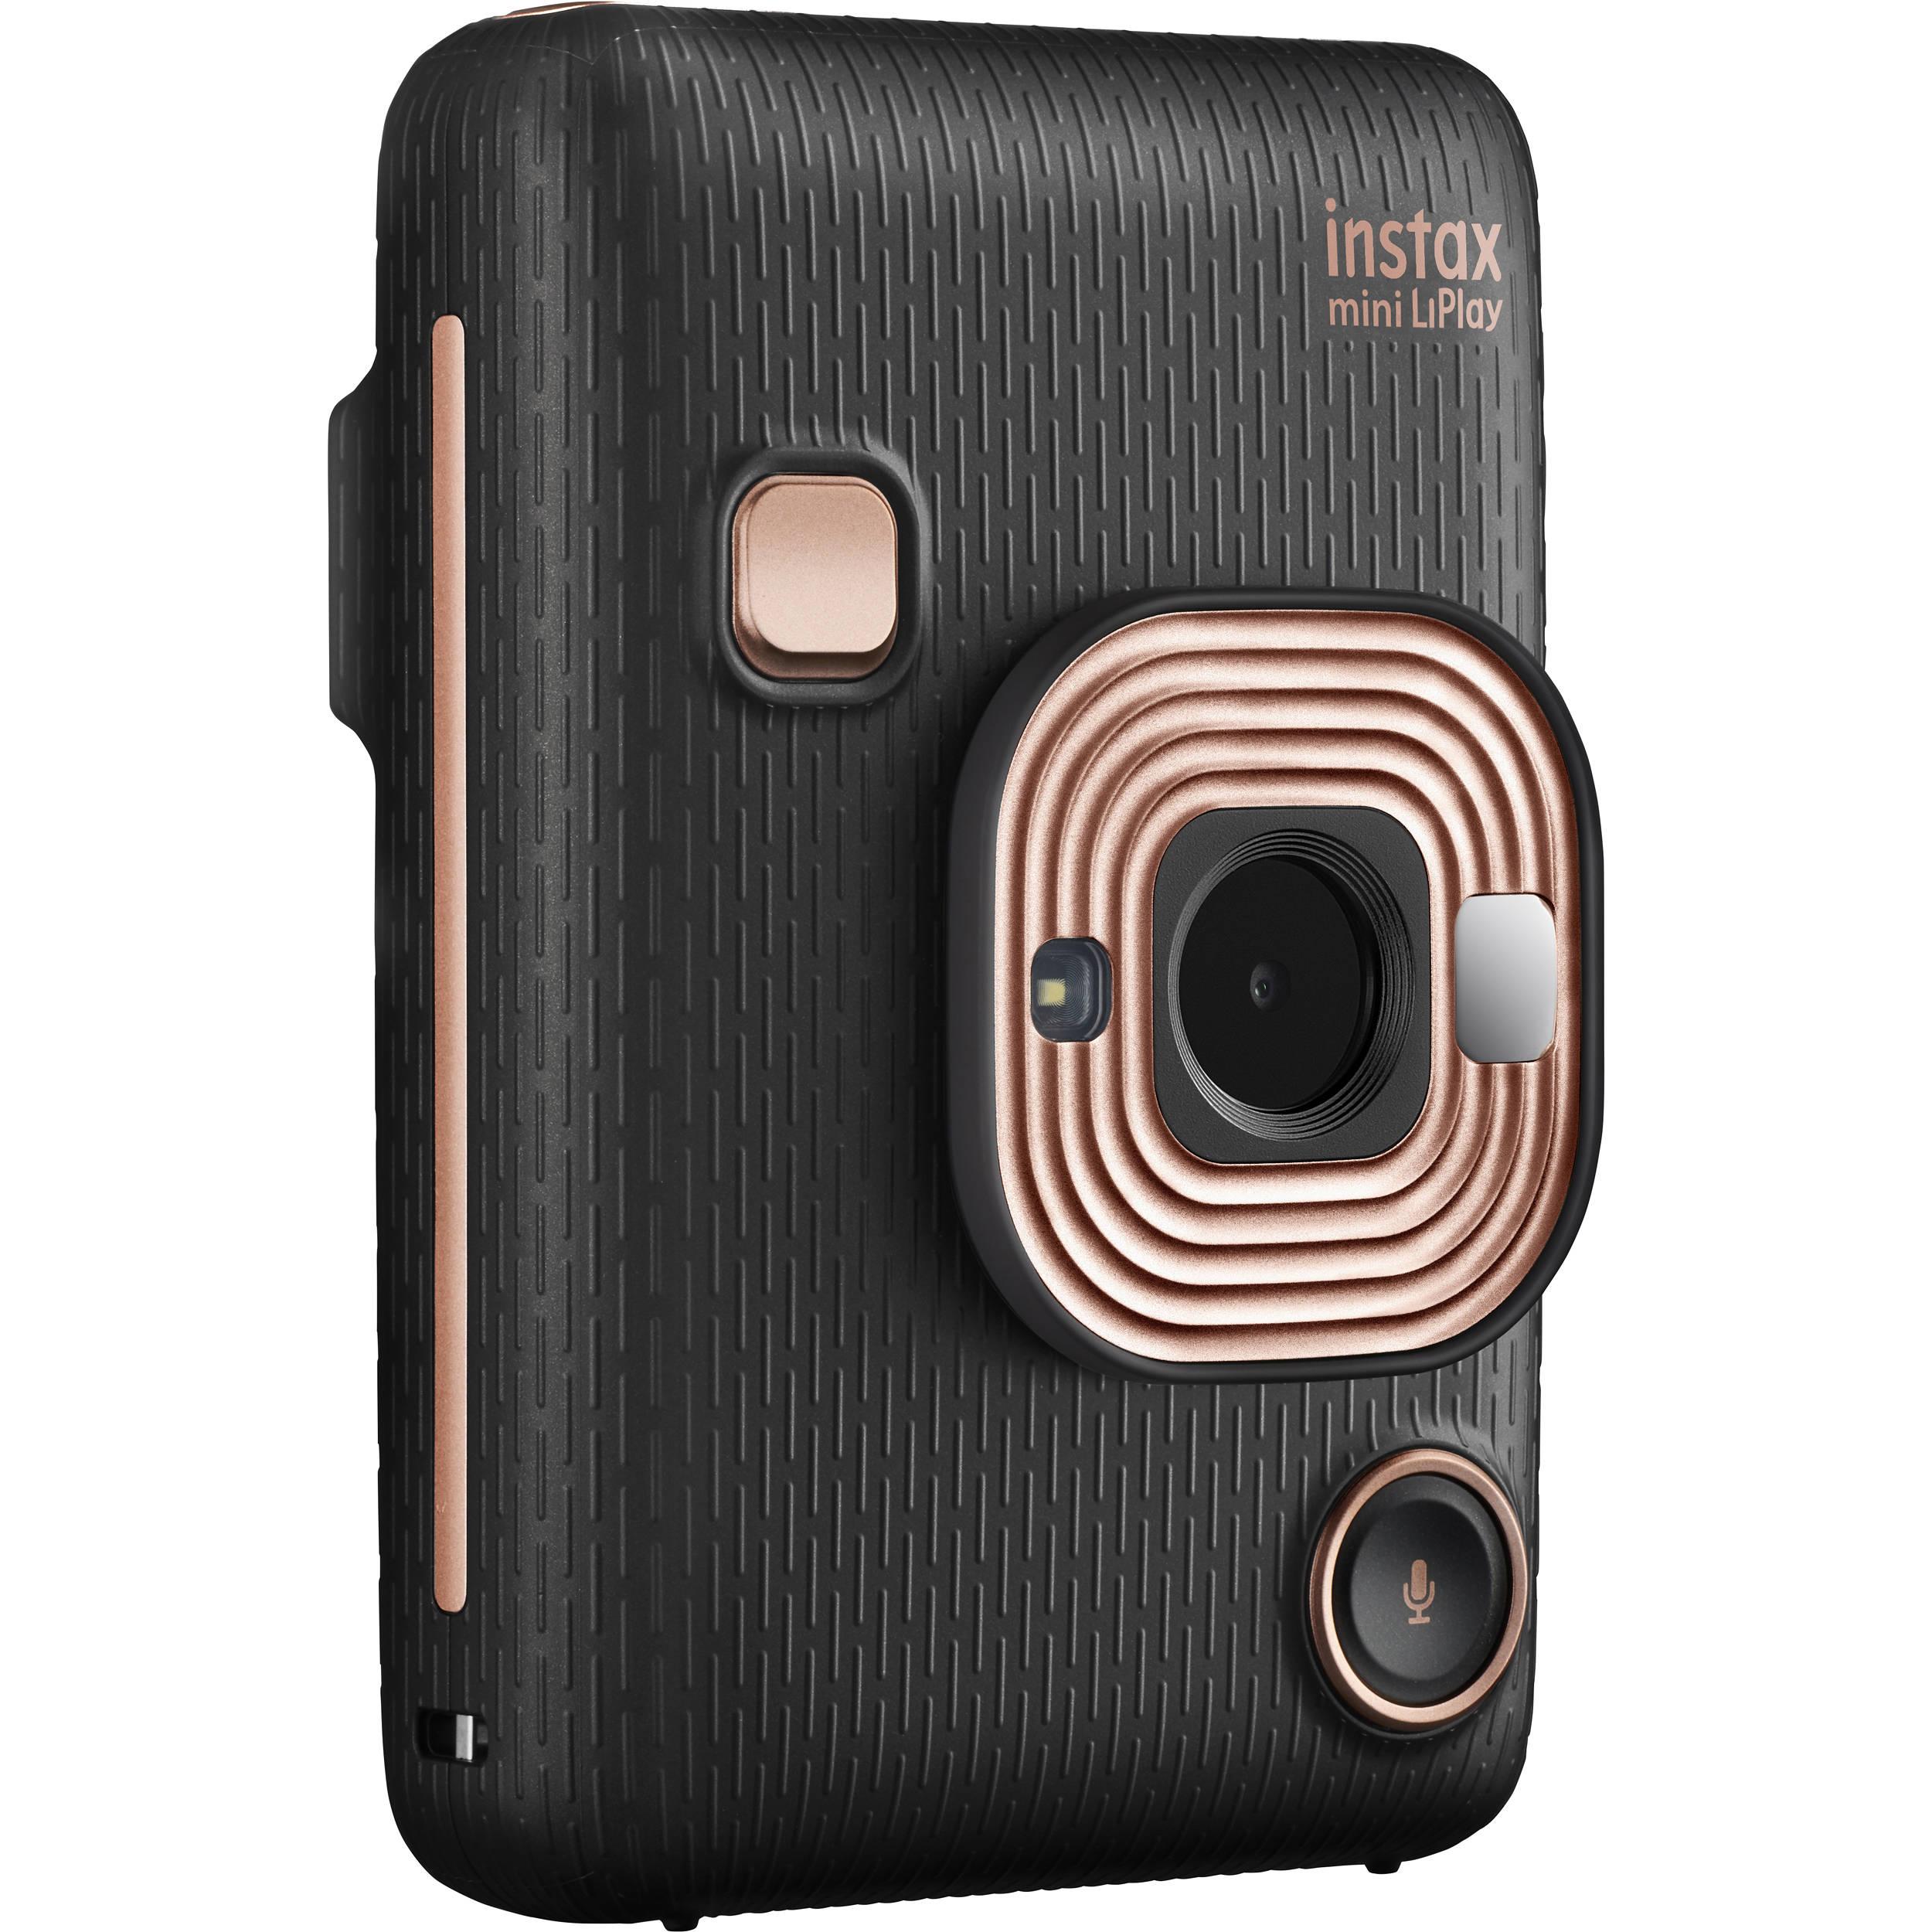 online store 9cc54 d28bc FUJIFILM INSTAX Mini LiPlay Hybrid Instant Camera (Elegant Black)